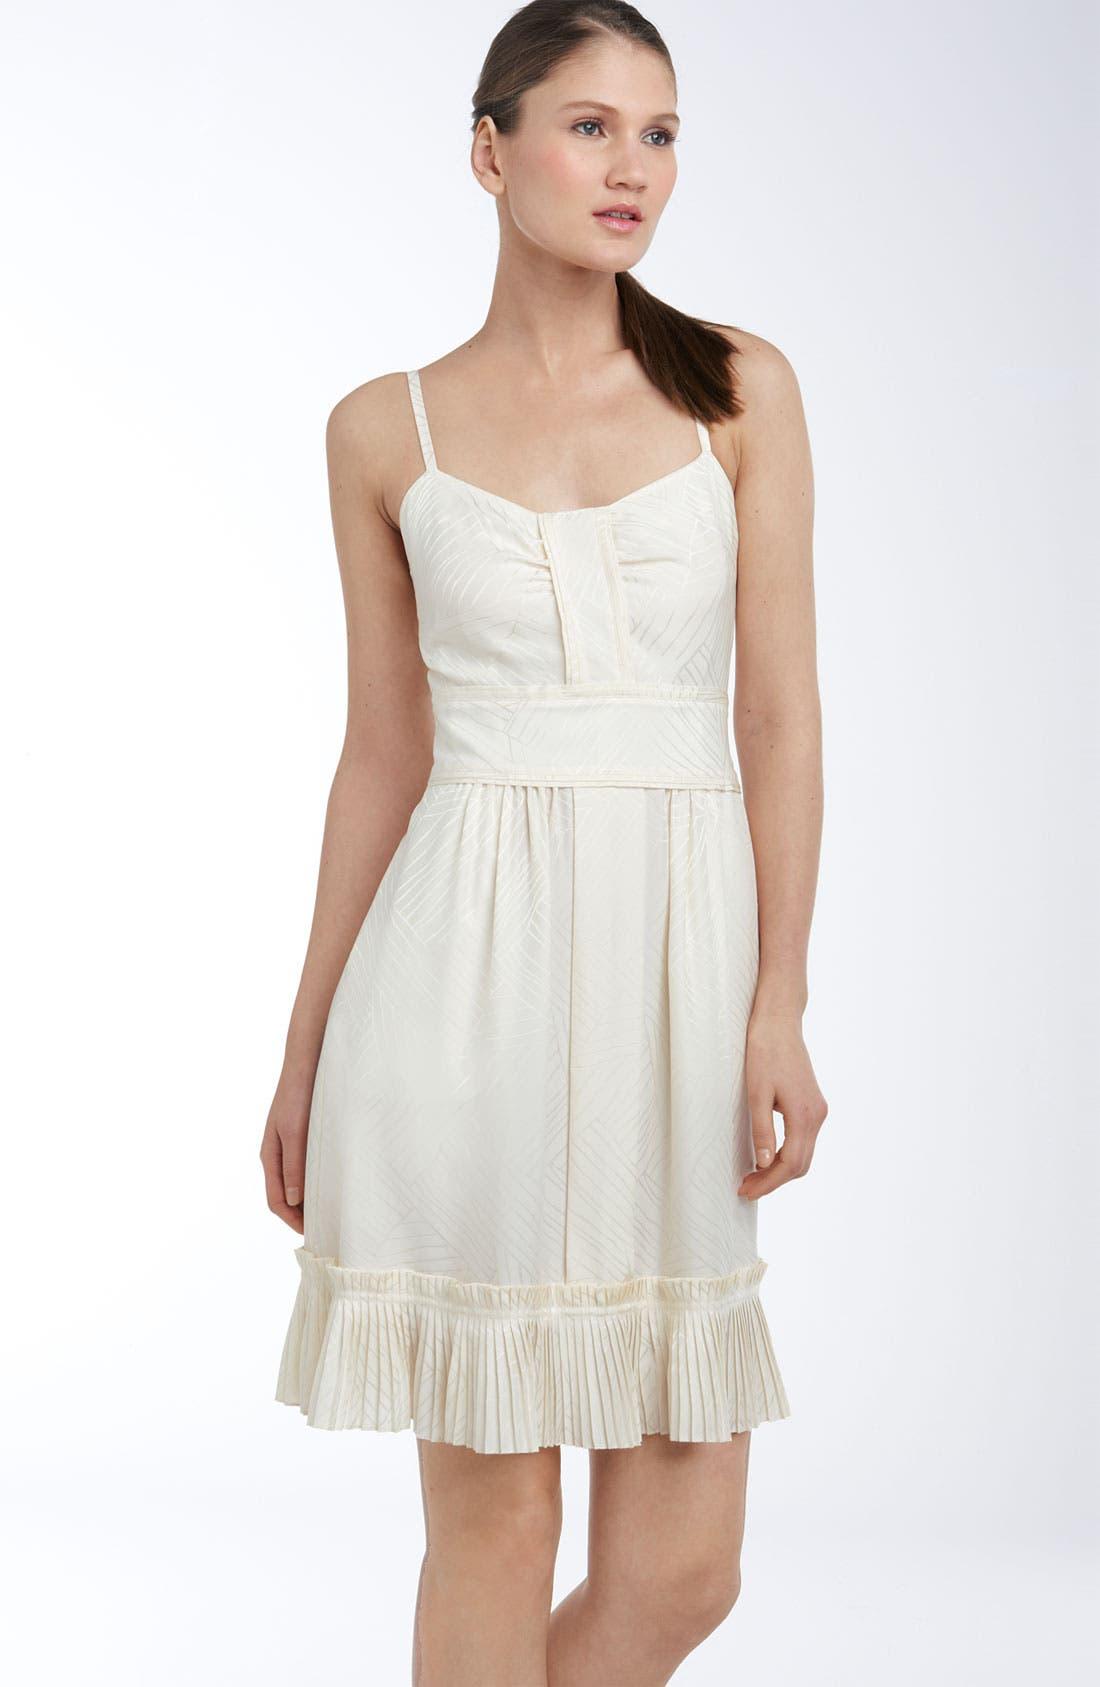 Alternate Image 1 Selected - MARC BY MARC JACOBS 'Yili' Jacquard Dress